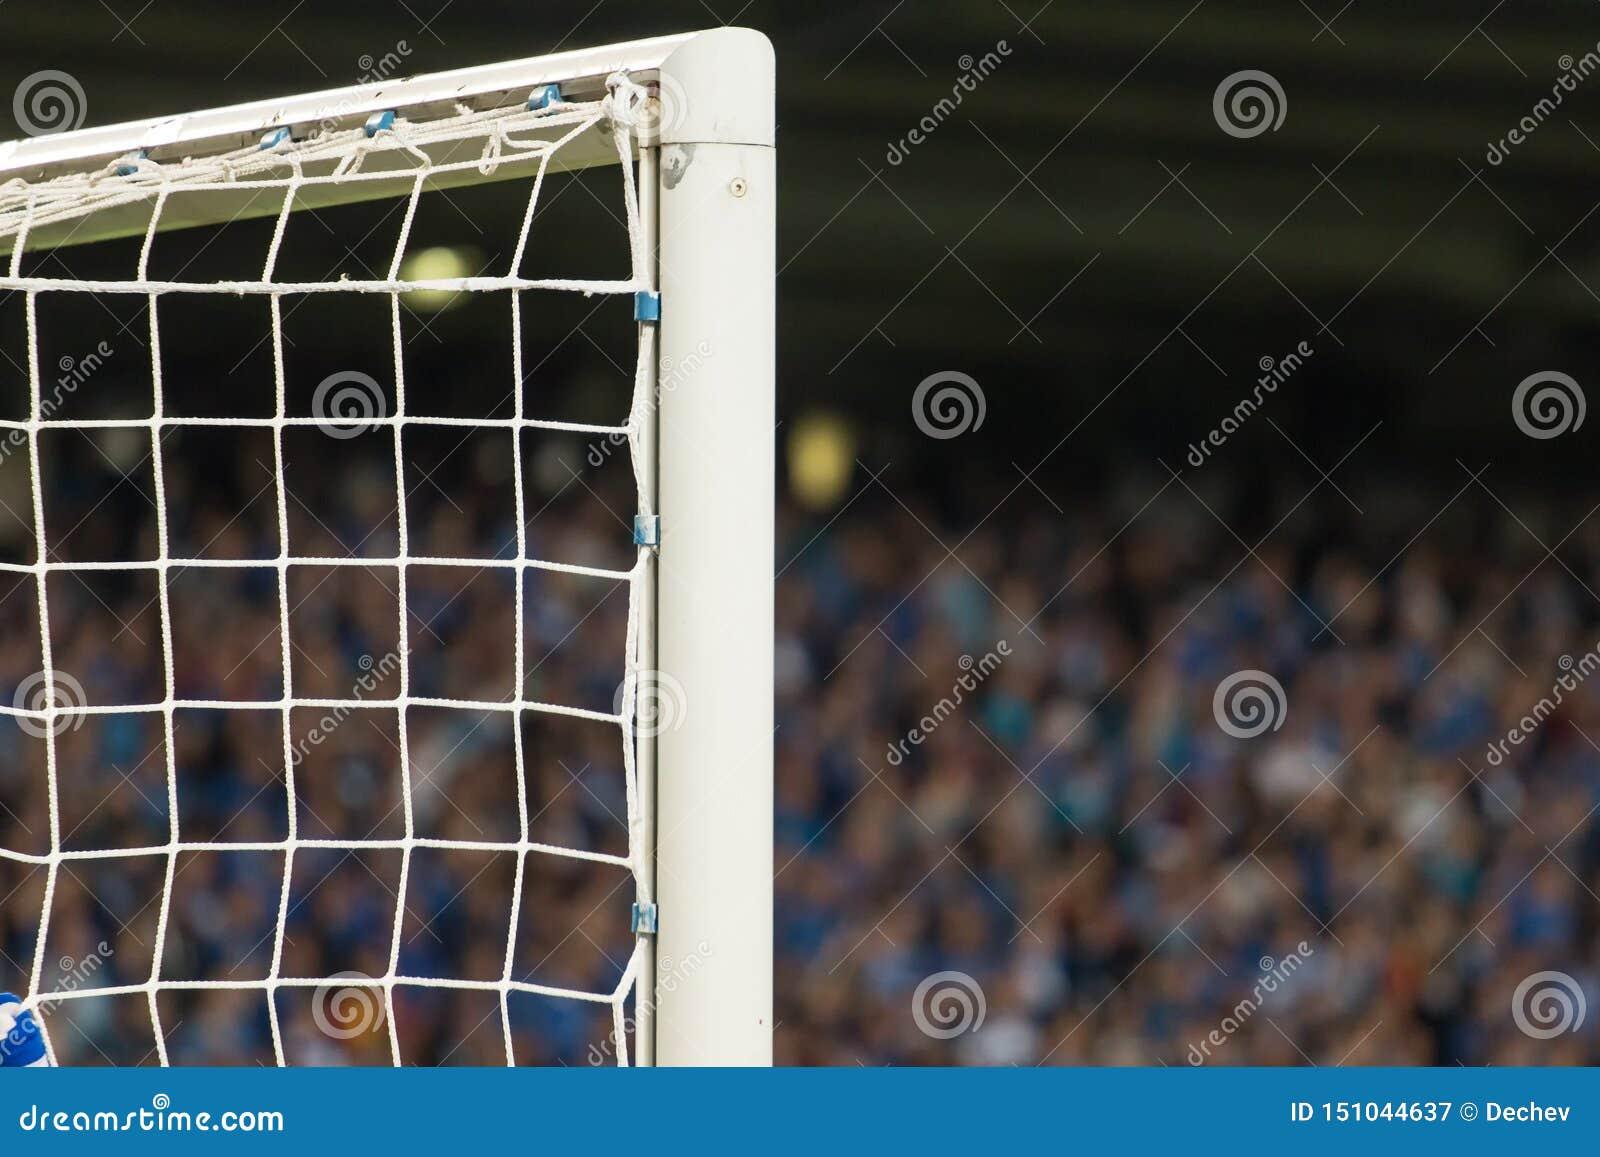 Столб цели с поклонниками футбола на заднем плане